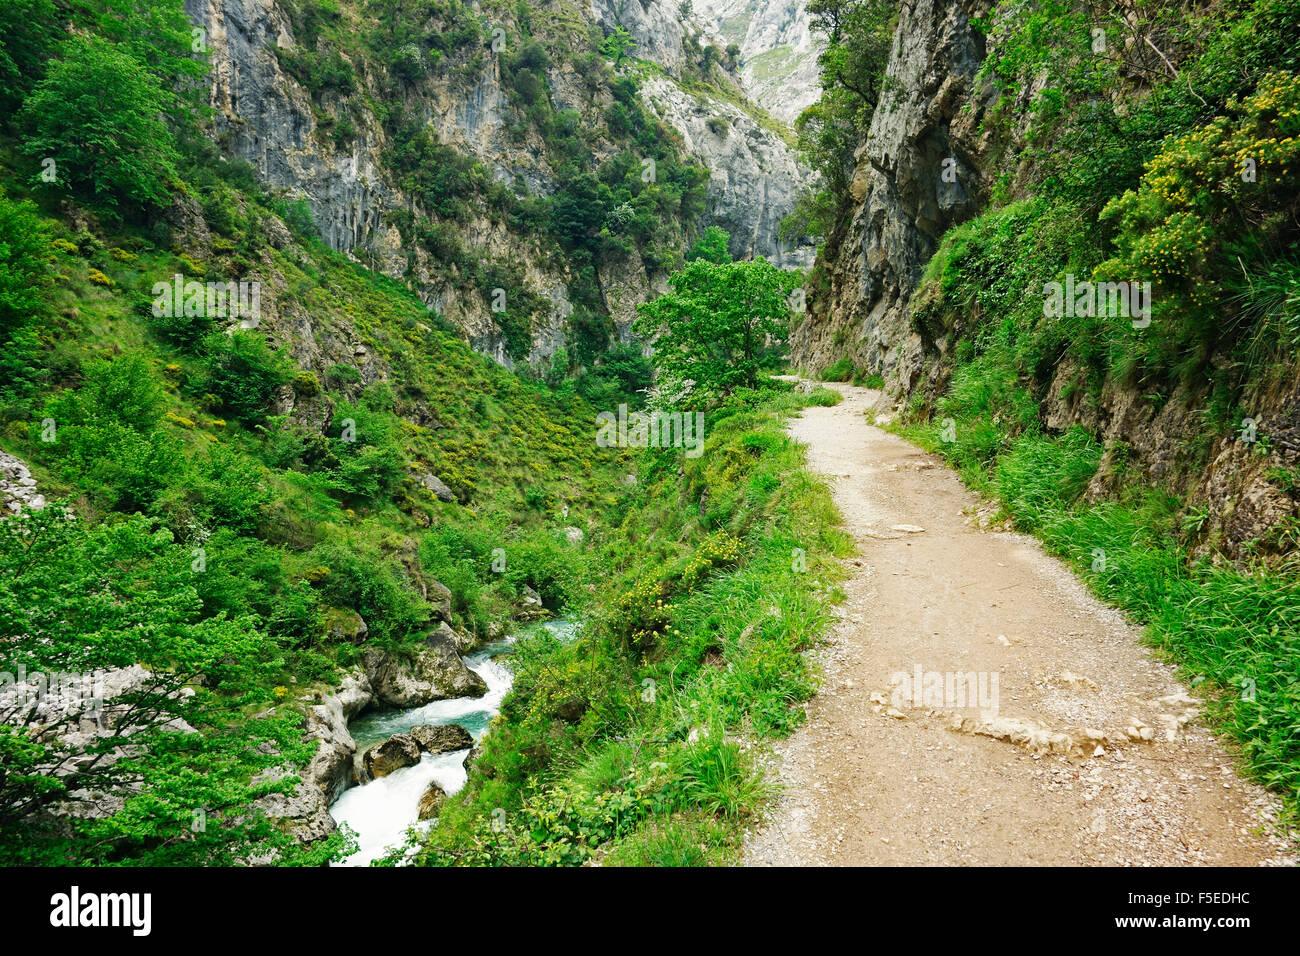 Sentier à travers Desfiladero del Rio Cares, Picos de Europa, Parque Nacional de los Picos de Europa, Asturias, Photo Stock